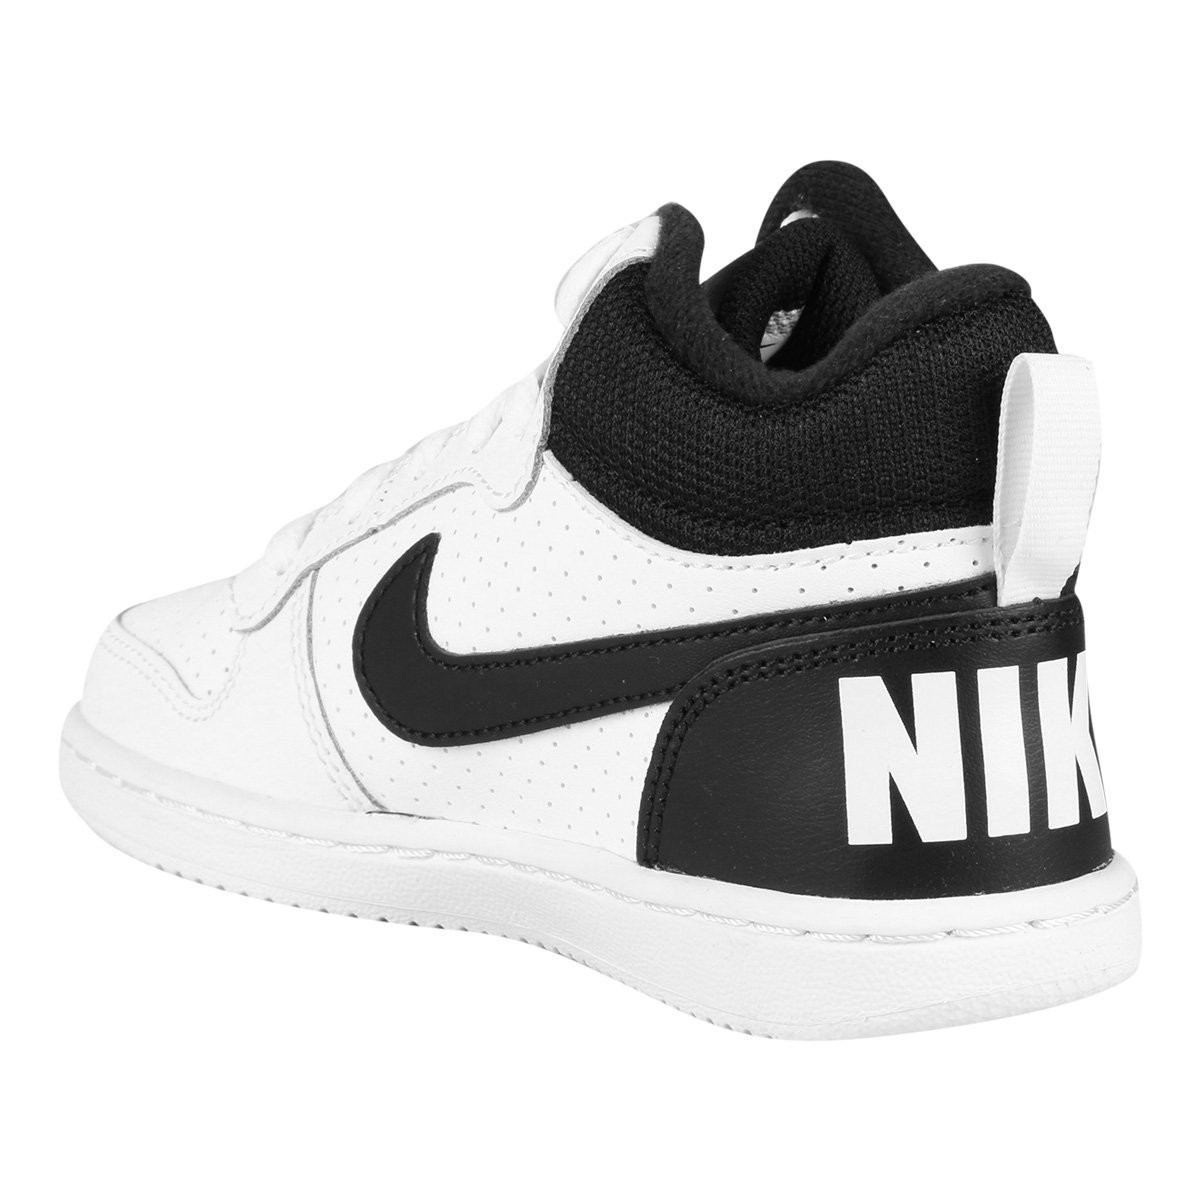 653483484b Tênis Couro Nike Court Borough Mid - Branco - Compre Agora